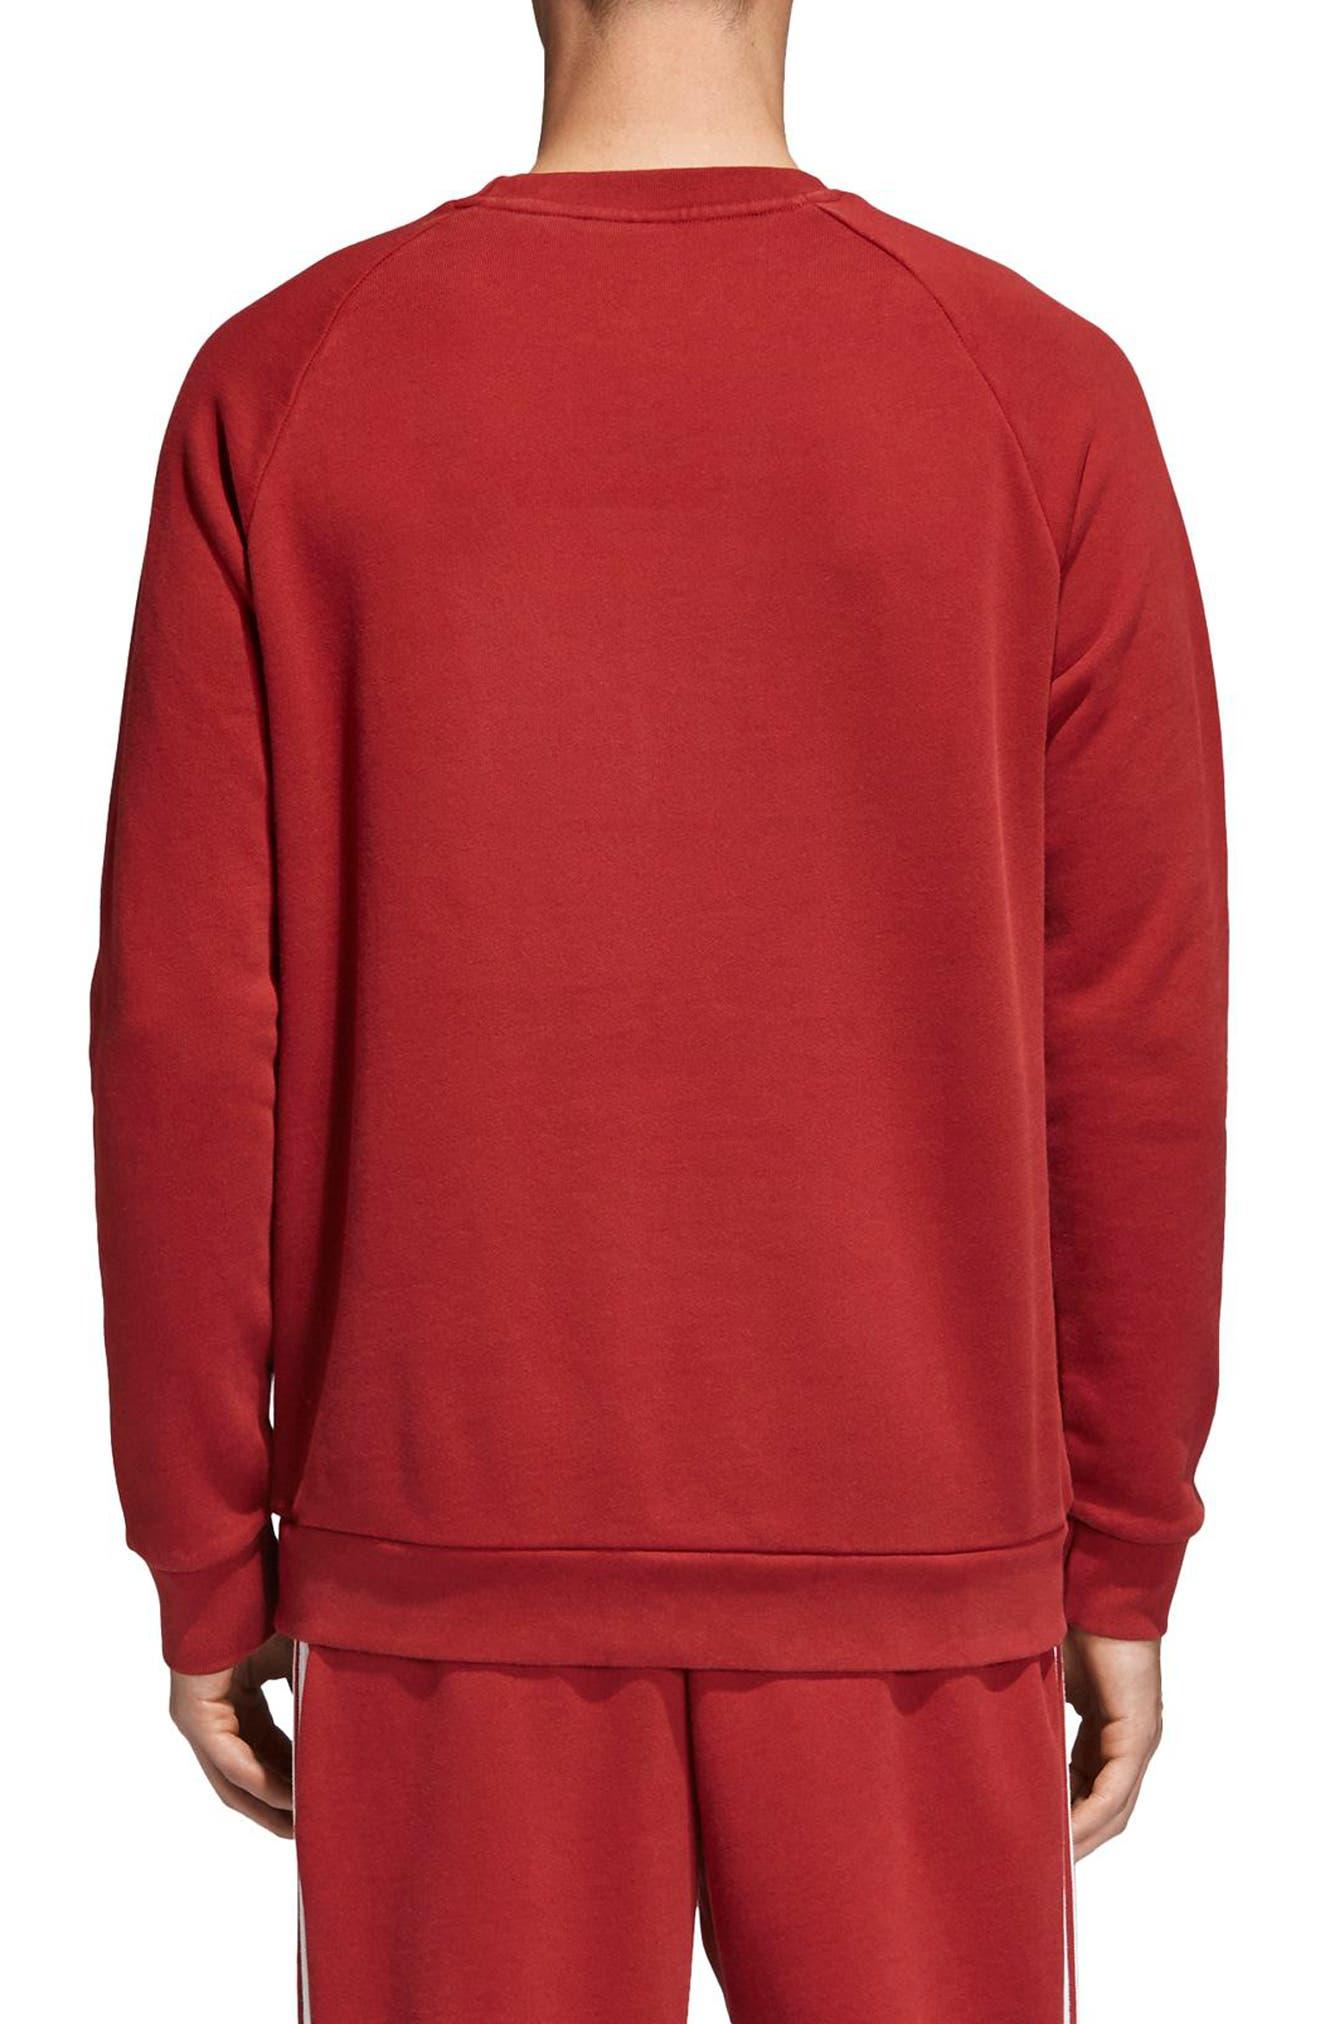 adidas Trefoil Crewneck Sweatshirt,                             Alternate thumbnail 4, color,